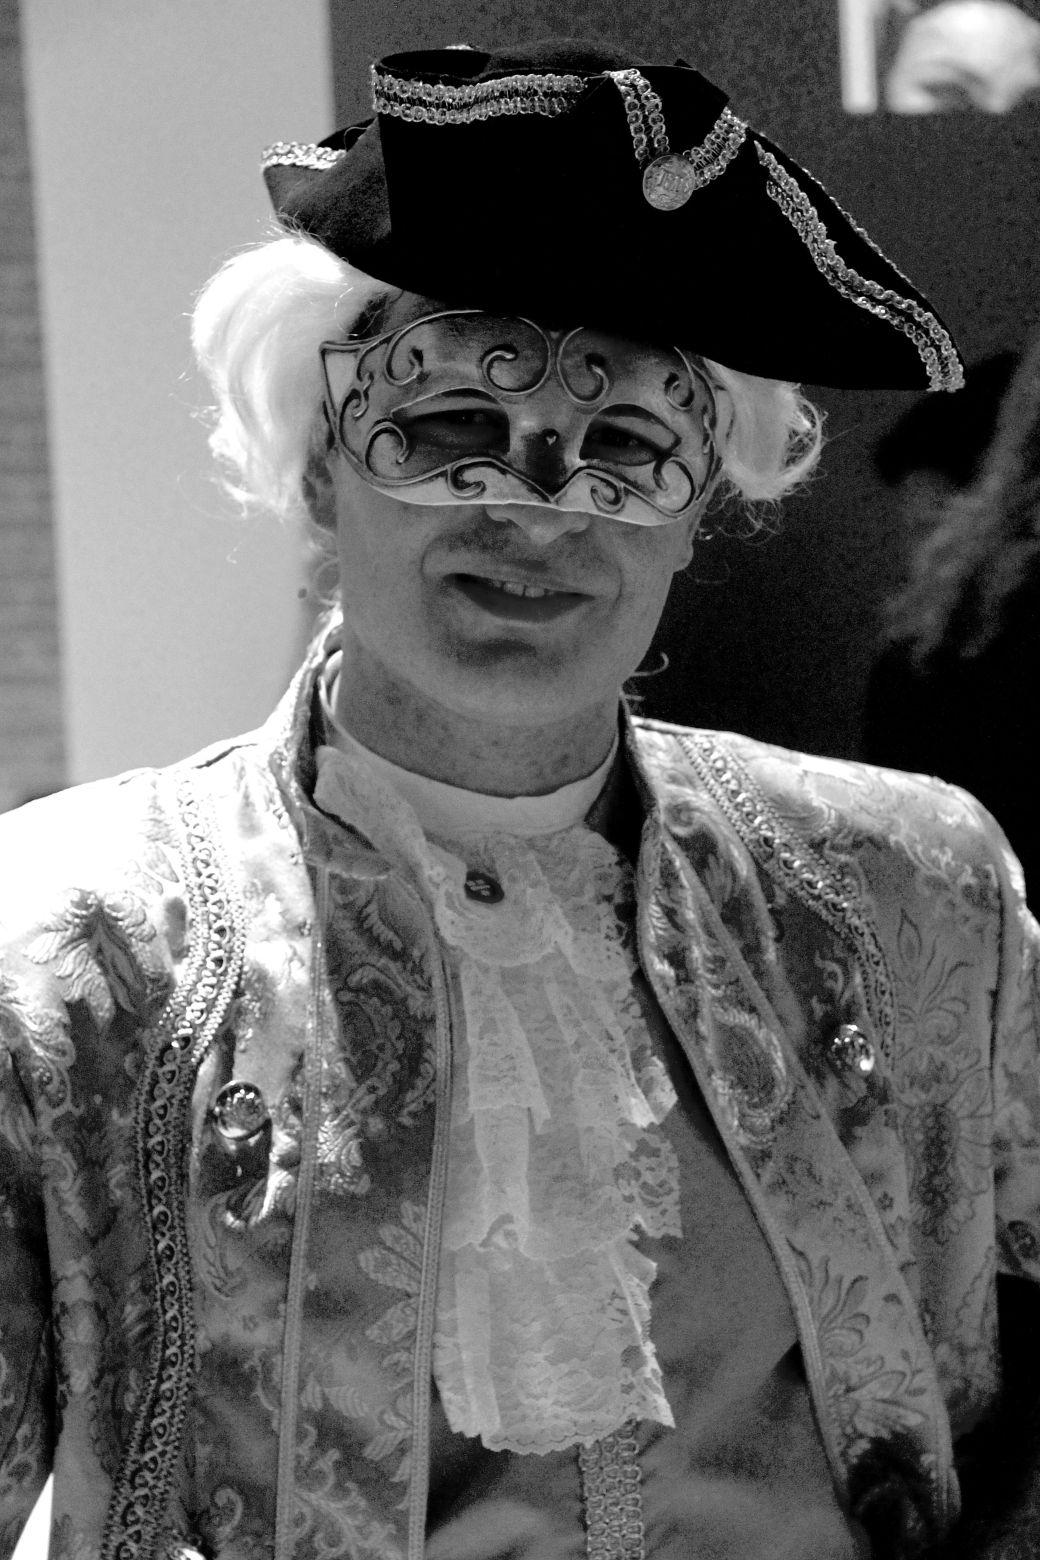 boston harvard masquerade ball john joseph moakley united states courthouse 30